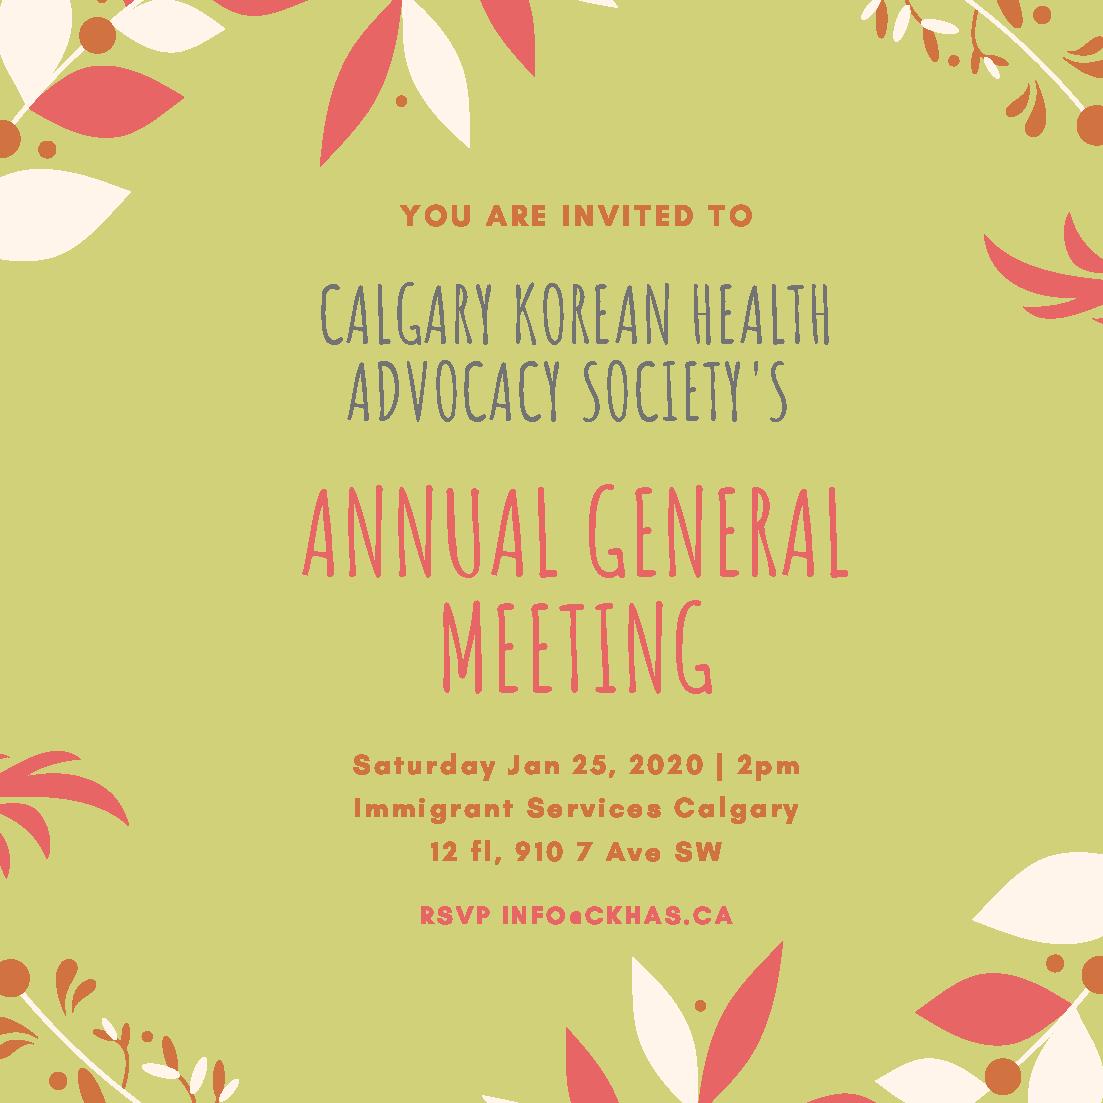 2019 Annual General Meeting  Copy